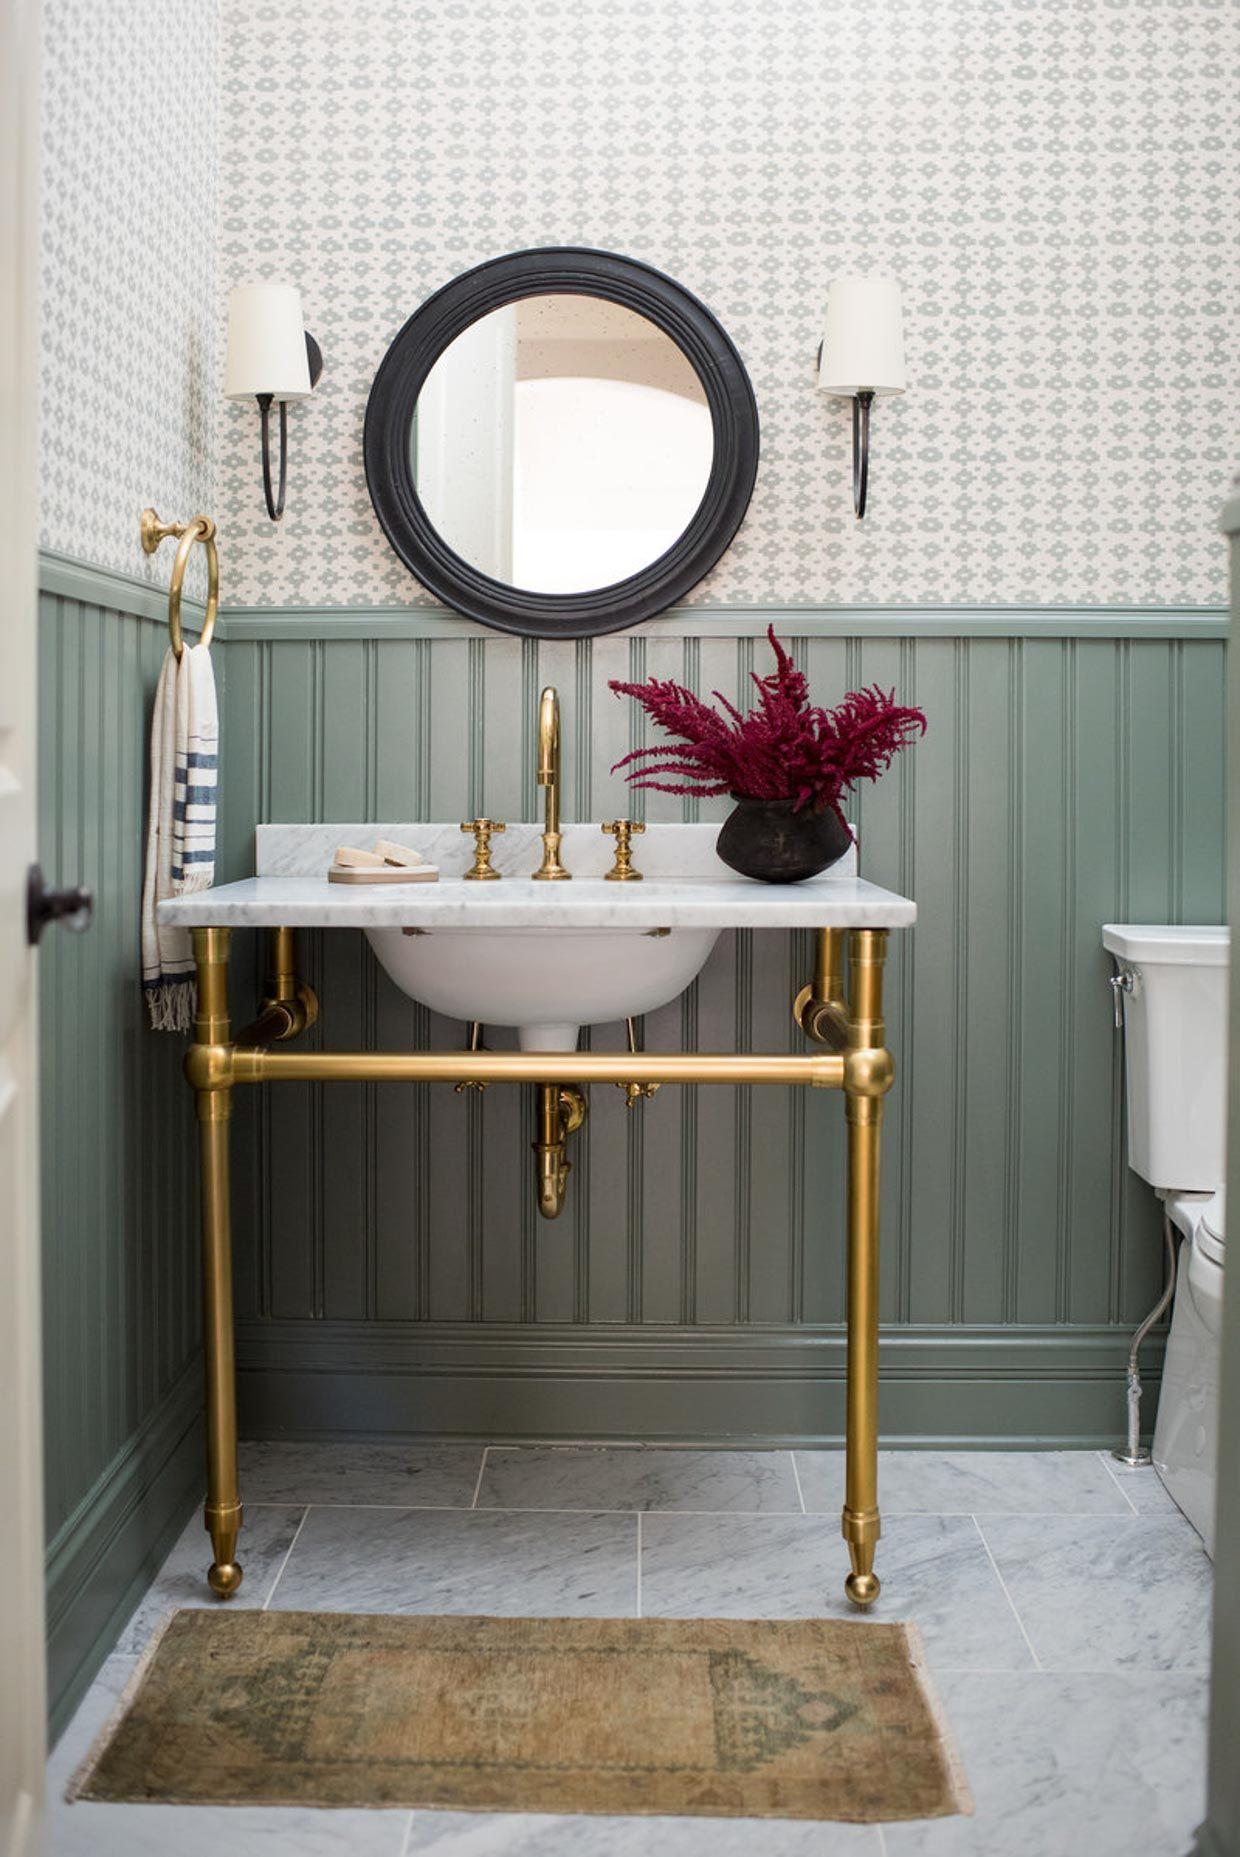 Photo of Small Bathroom Wallpaper Ideas | Poor Little It Girl